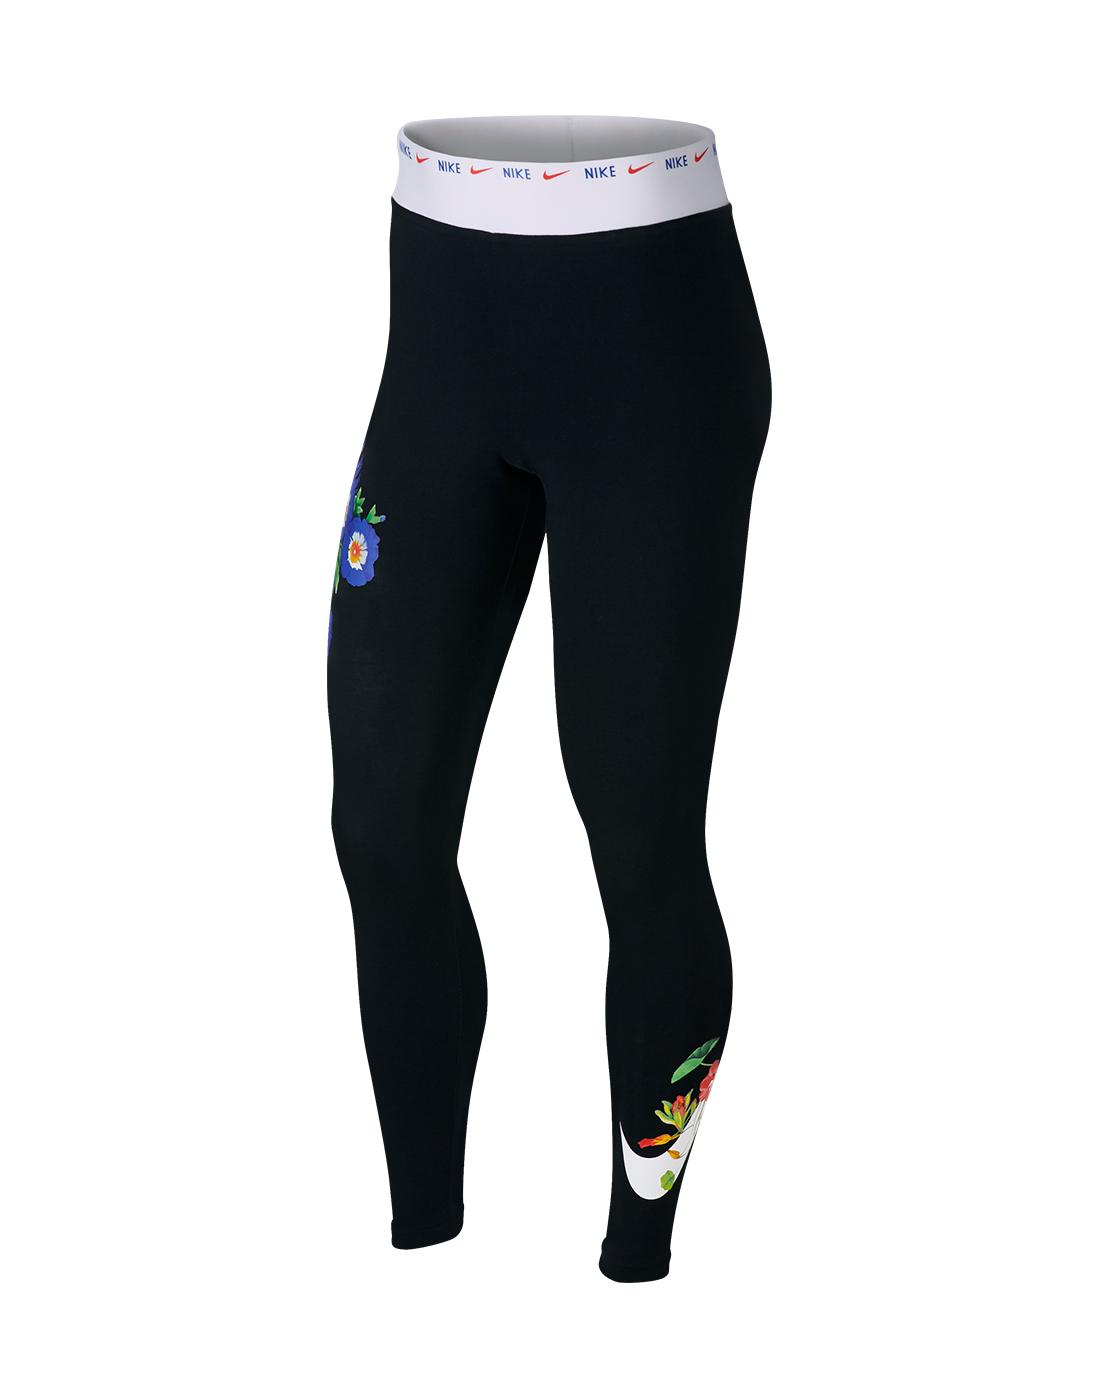 f99ddcba17bd2 Women's Black Nike Floral Leggings | Life Style Sports